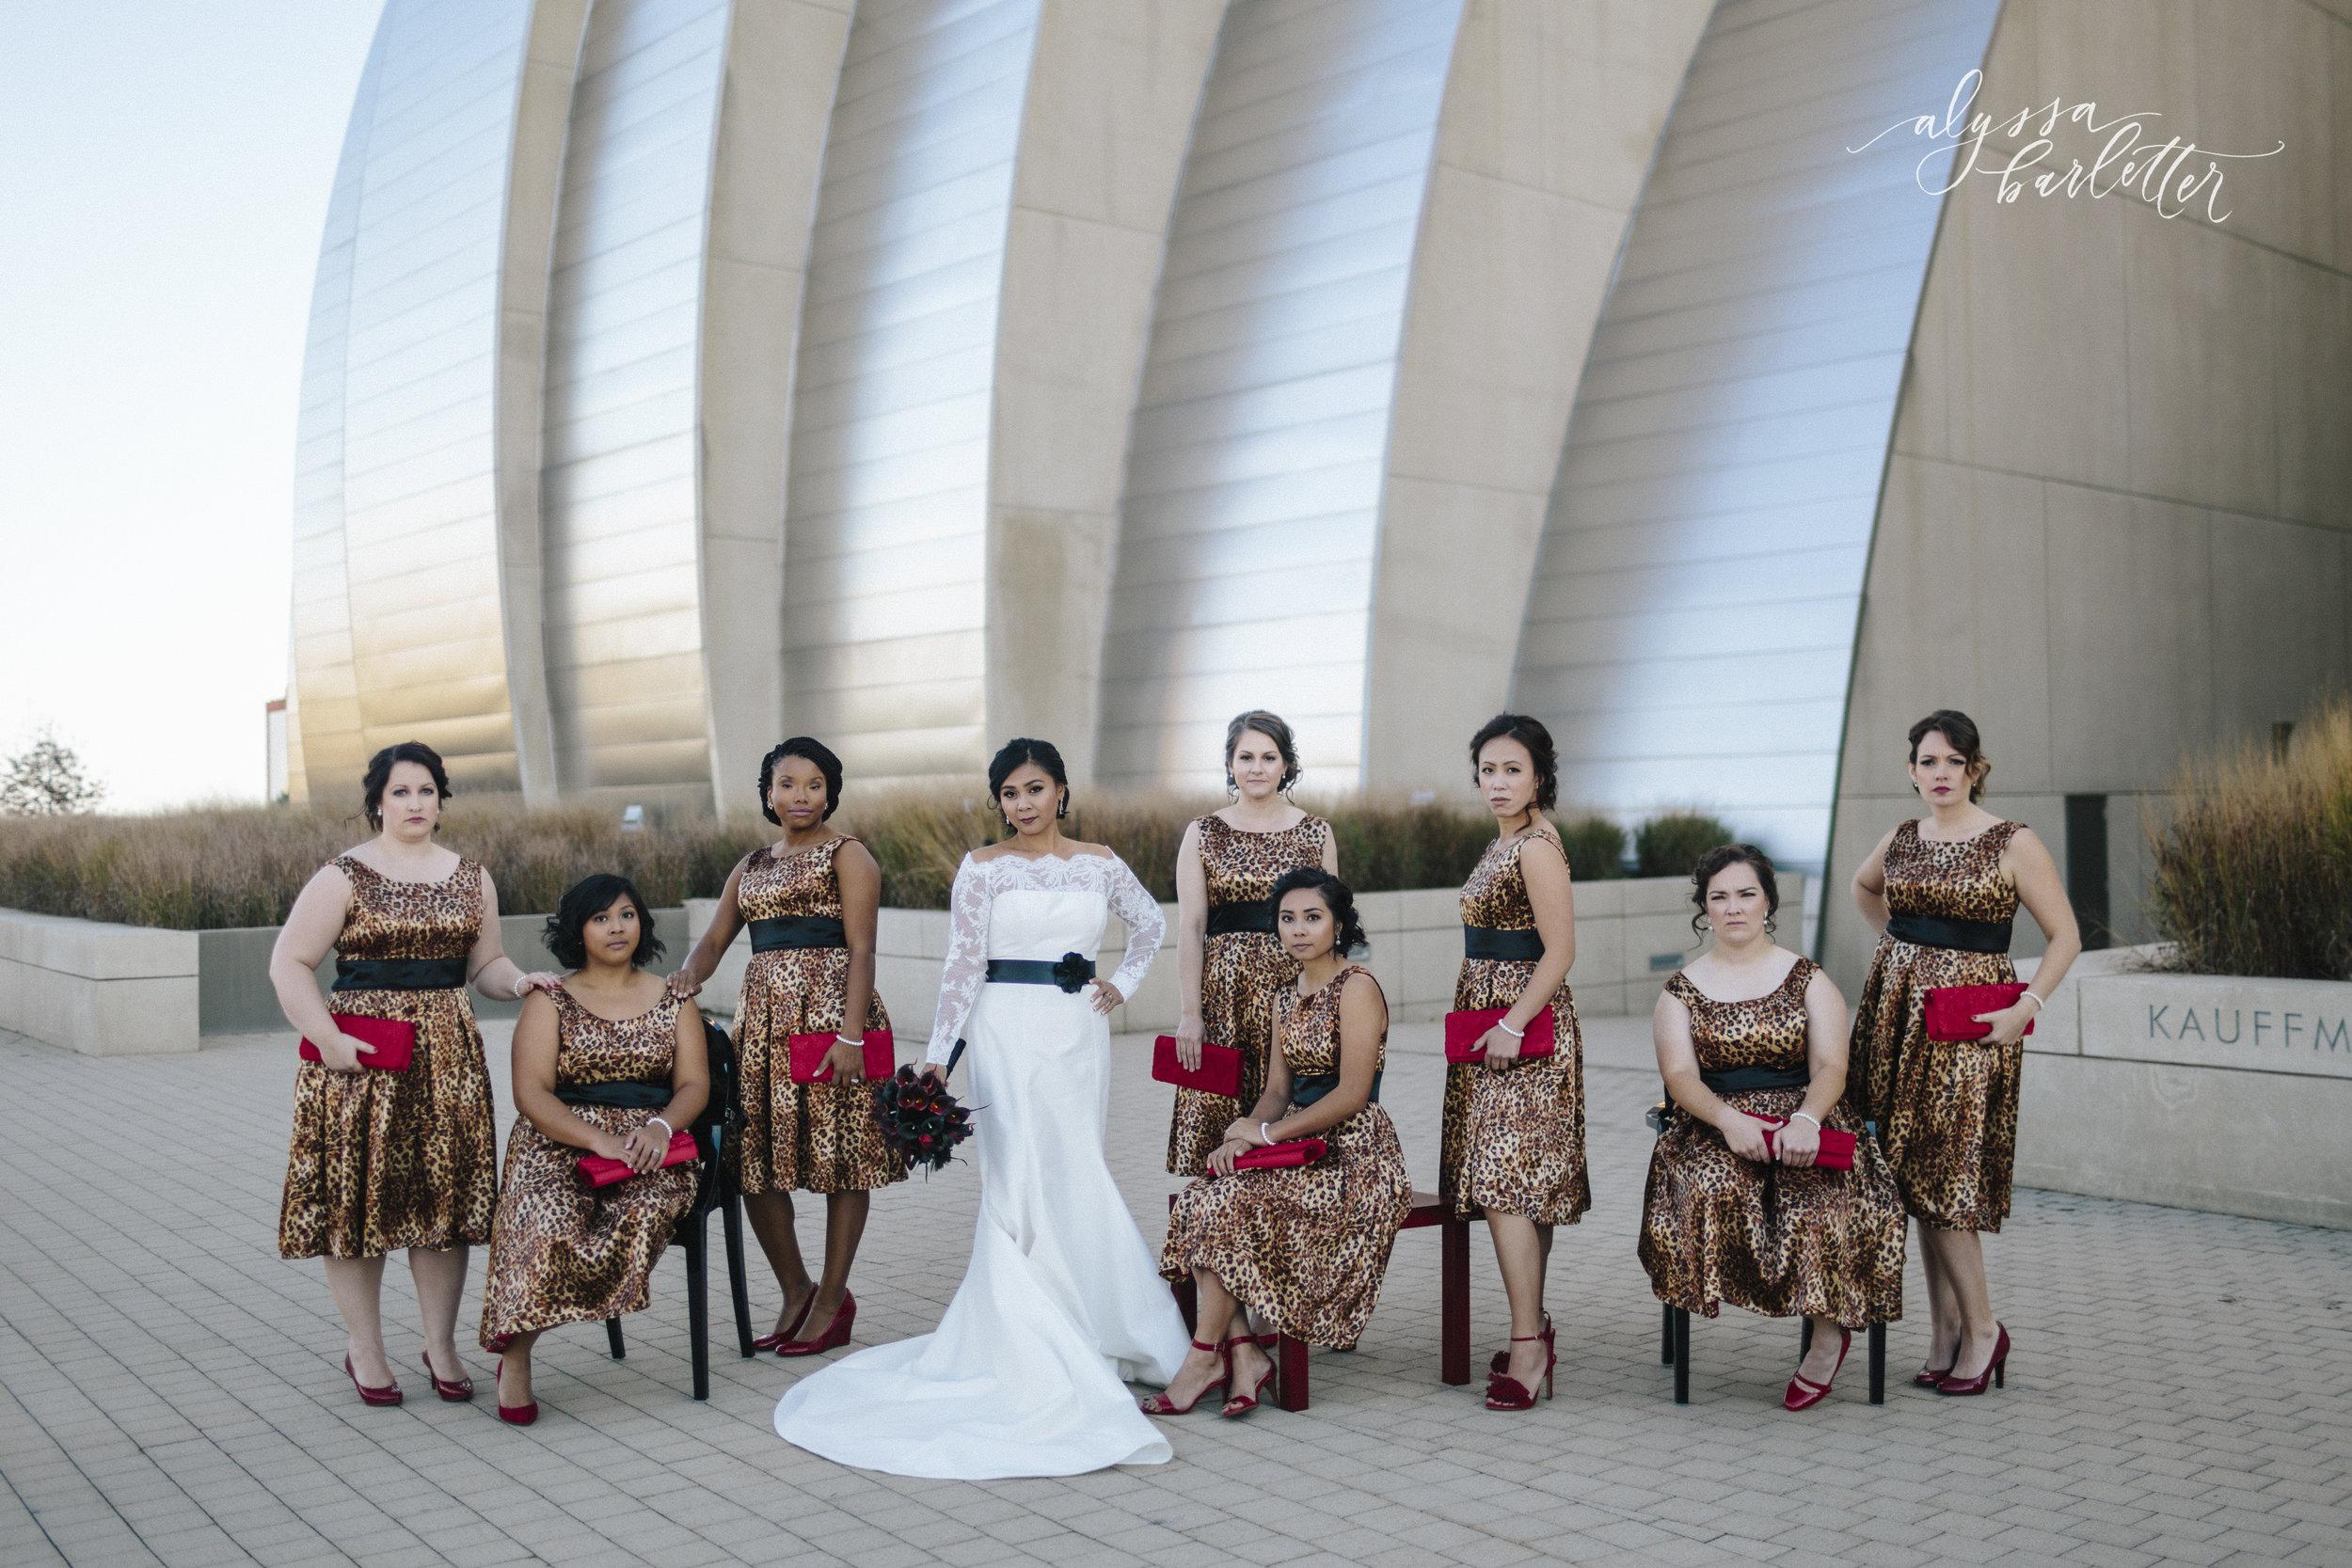 alyssa barletter photography union station wedding photos leopard print winter wedding-1-26.jpg